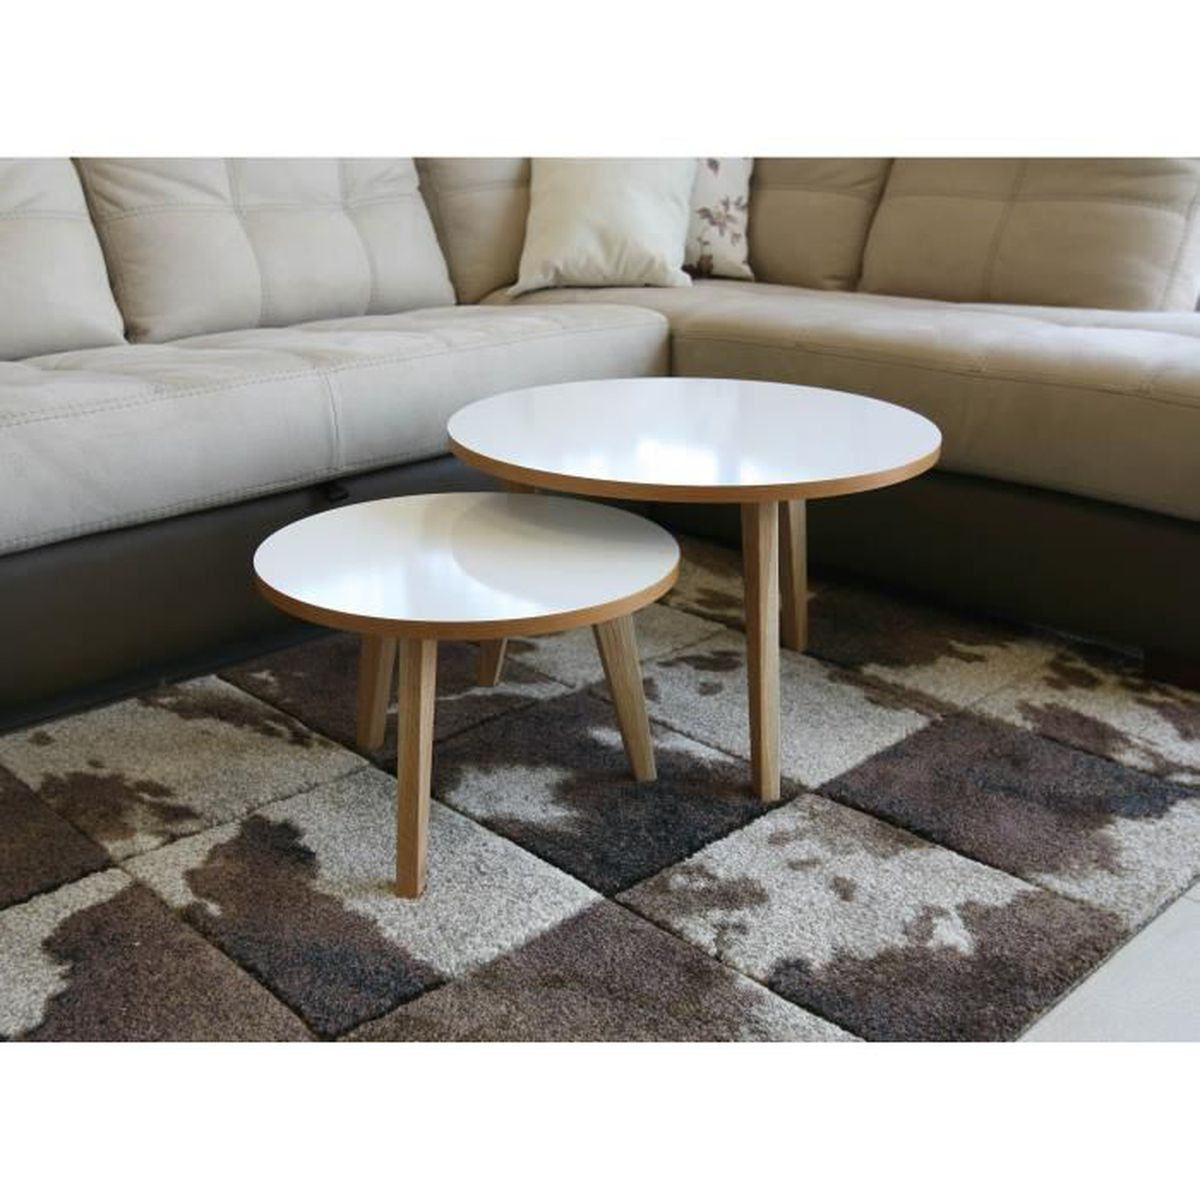 Table basse gigogne JIMI lot de 7 design scandinave - Achat